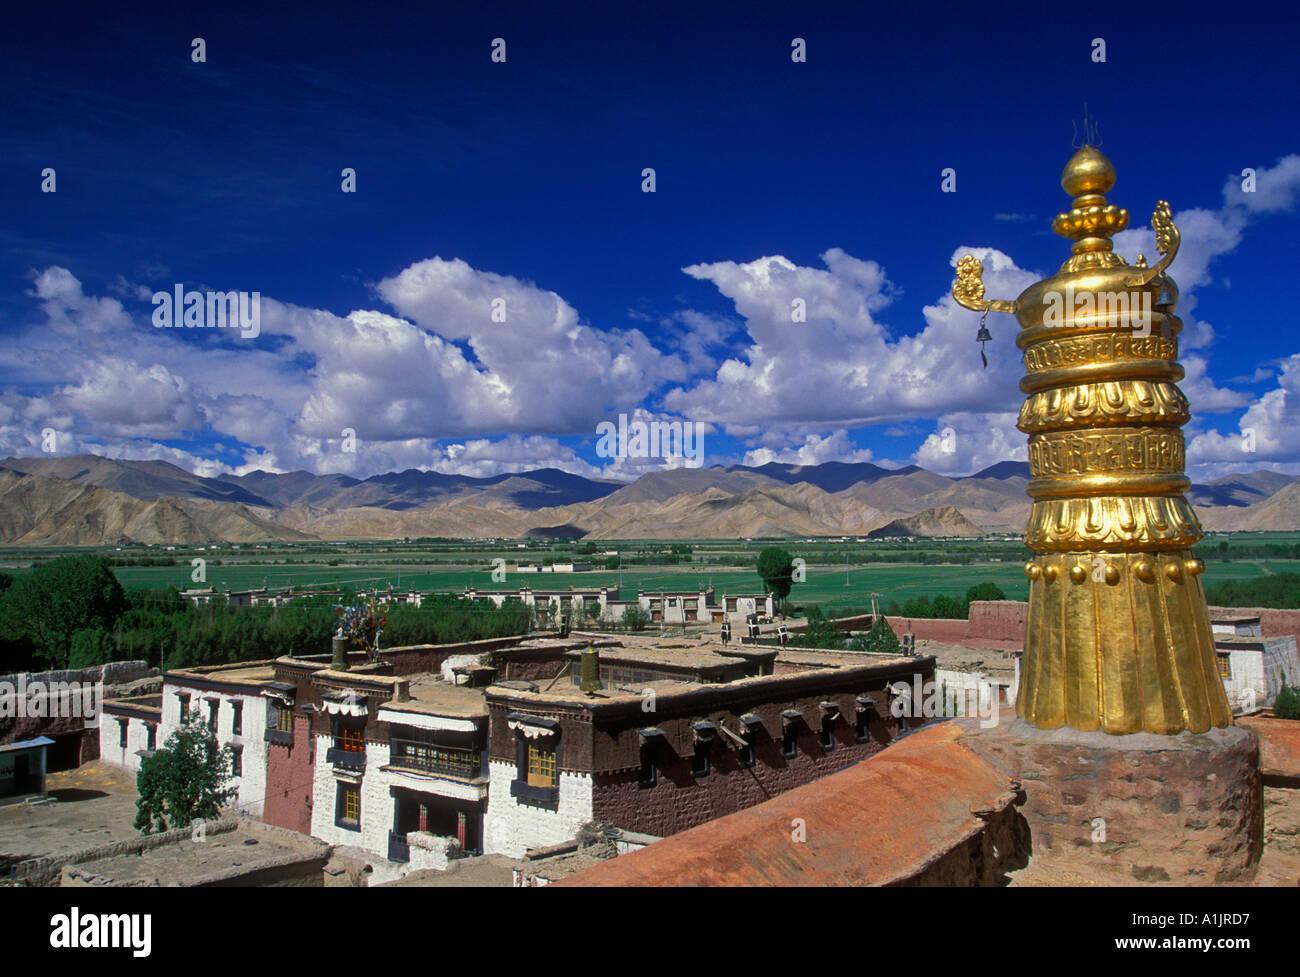 brass bell tower, Pelkor Chode Monastery, Buddhism, Buddhist monastery, Buddhist temple, temple, town of Gyantse, Tibet Autonomous Region, China, Asia - Stock Image